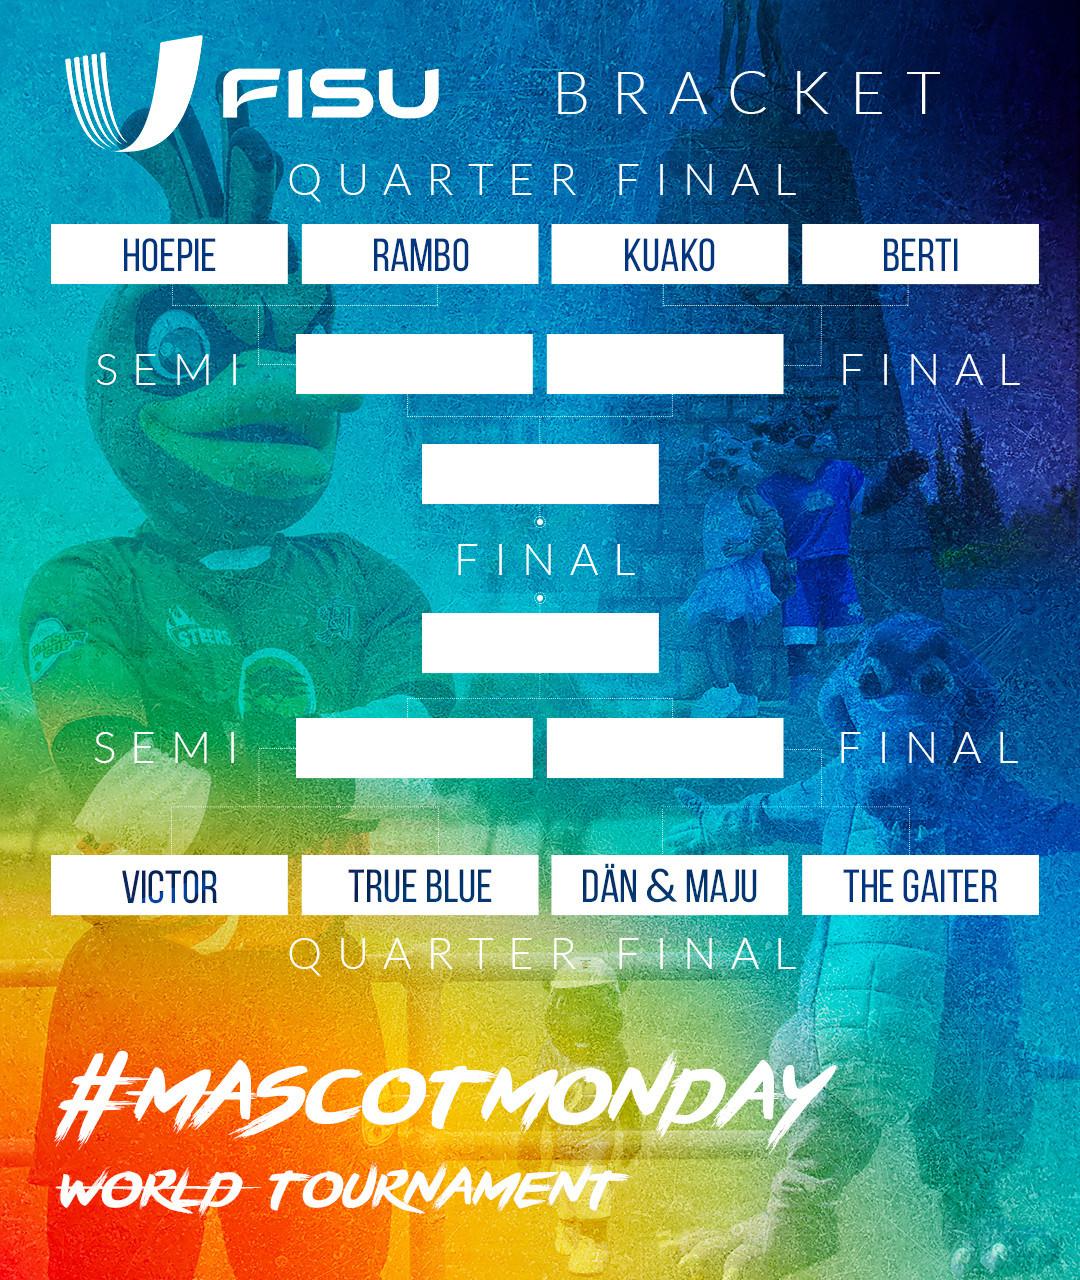 FISU's #MascotMonday contest returns with mascots from individual universities